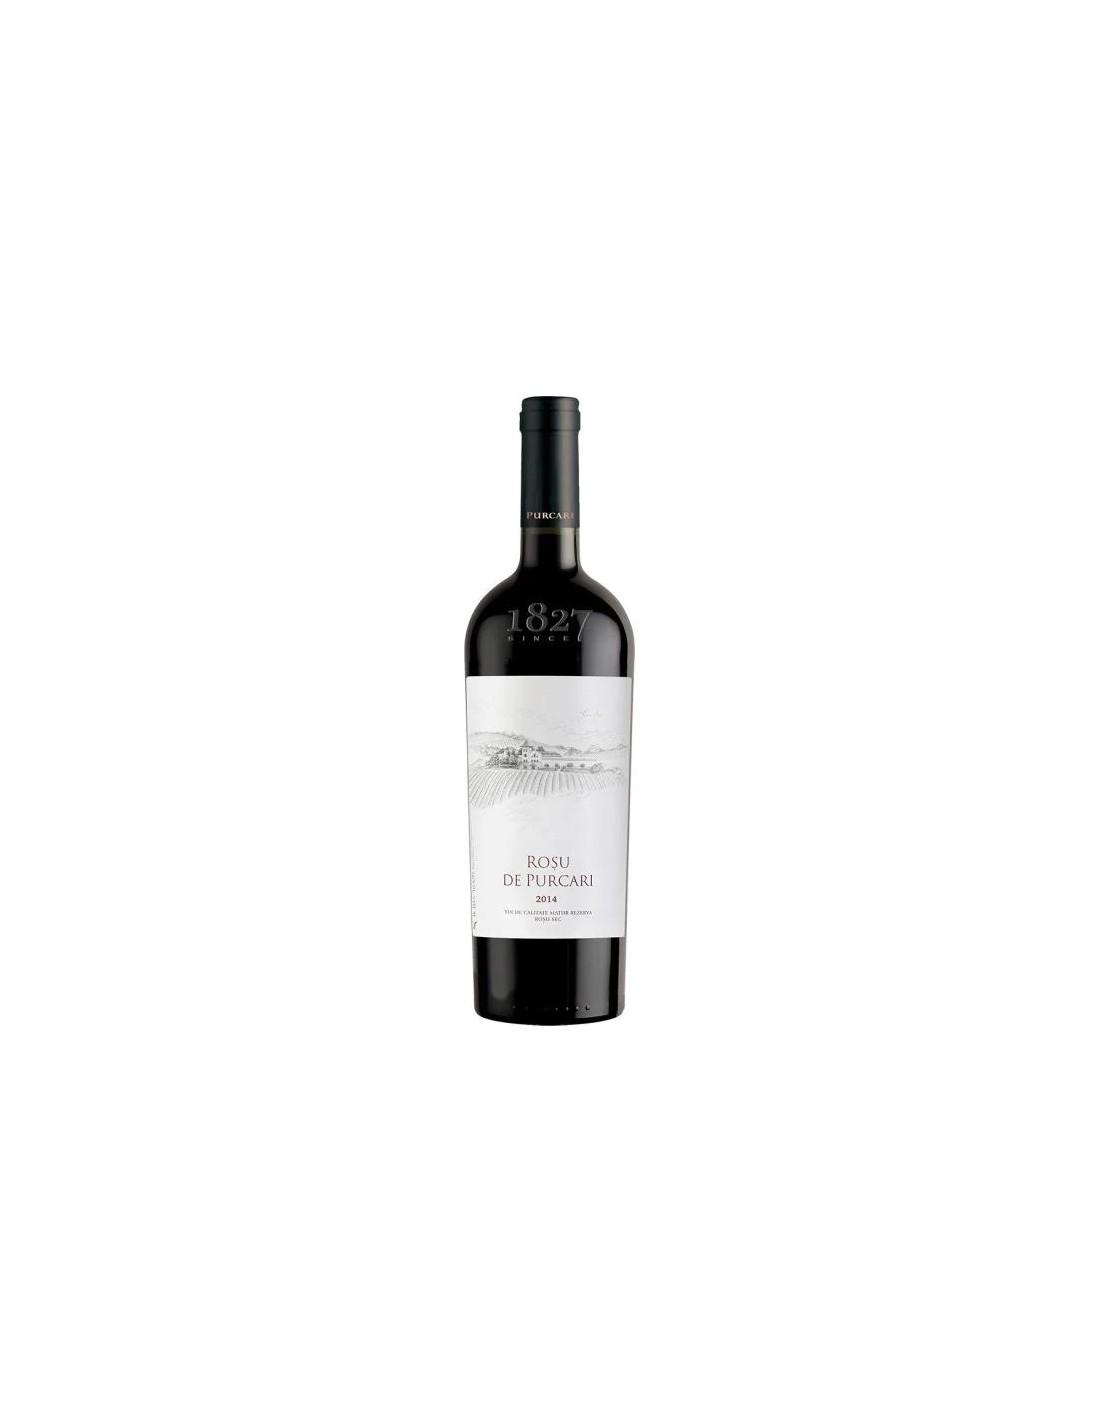 Vin rosu sec, Cupaj, Rosu de Purcari, 13.5% alc., 0.75L, Republica Moldova